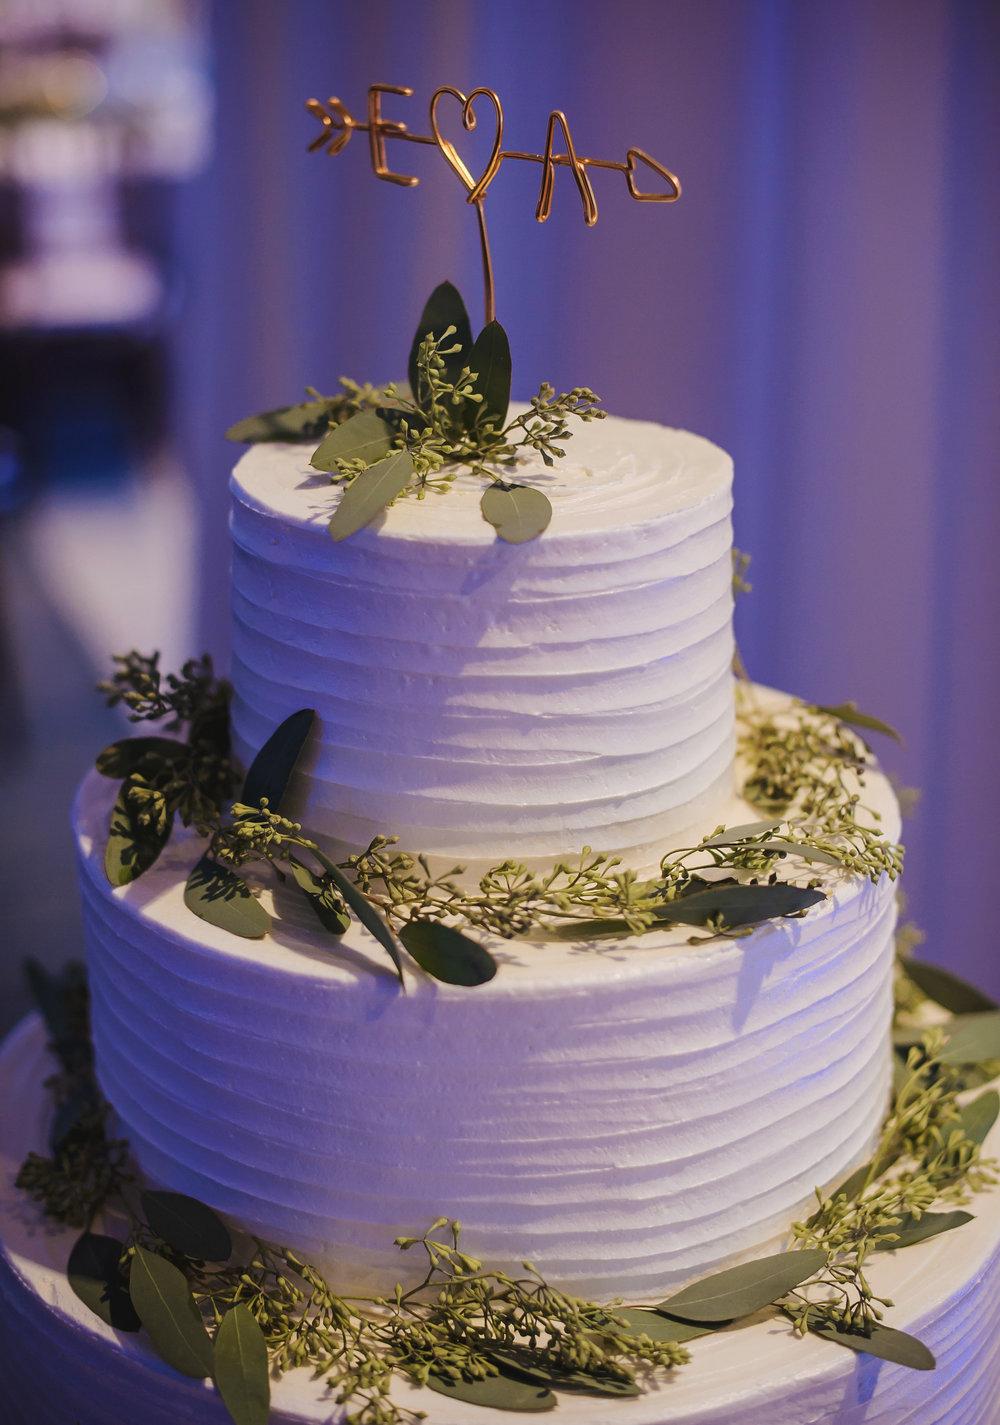 Baltimore Legg Mason Tower Wedding | East Made Event Company Baltimore Maryland Wedding Planner | Photo by Hannah Gunnell7445.jpg